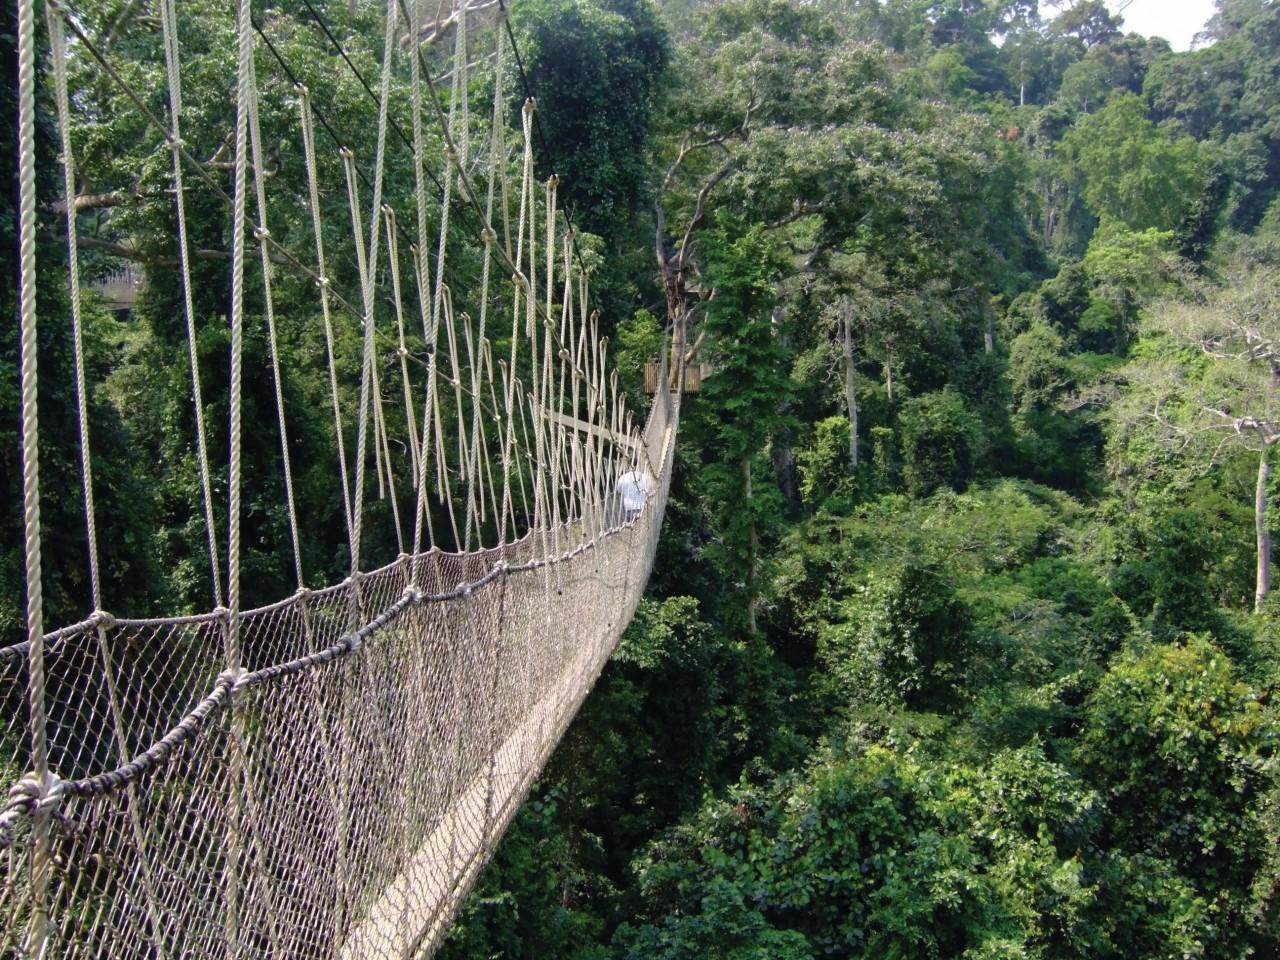 Parcours du Canopy au Kakum National Park. (© bytestrolch - iStockphoto.com))